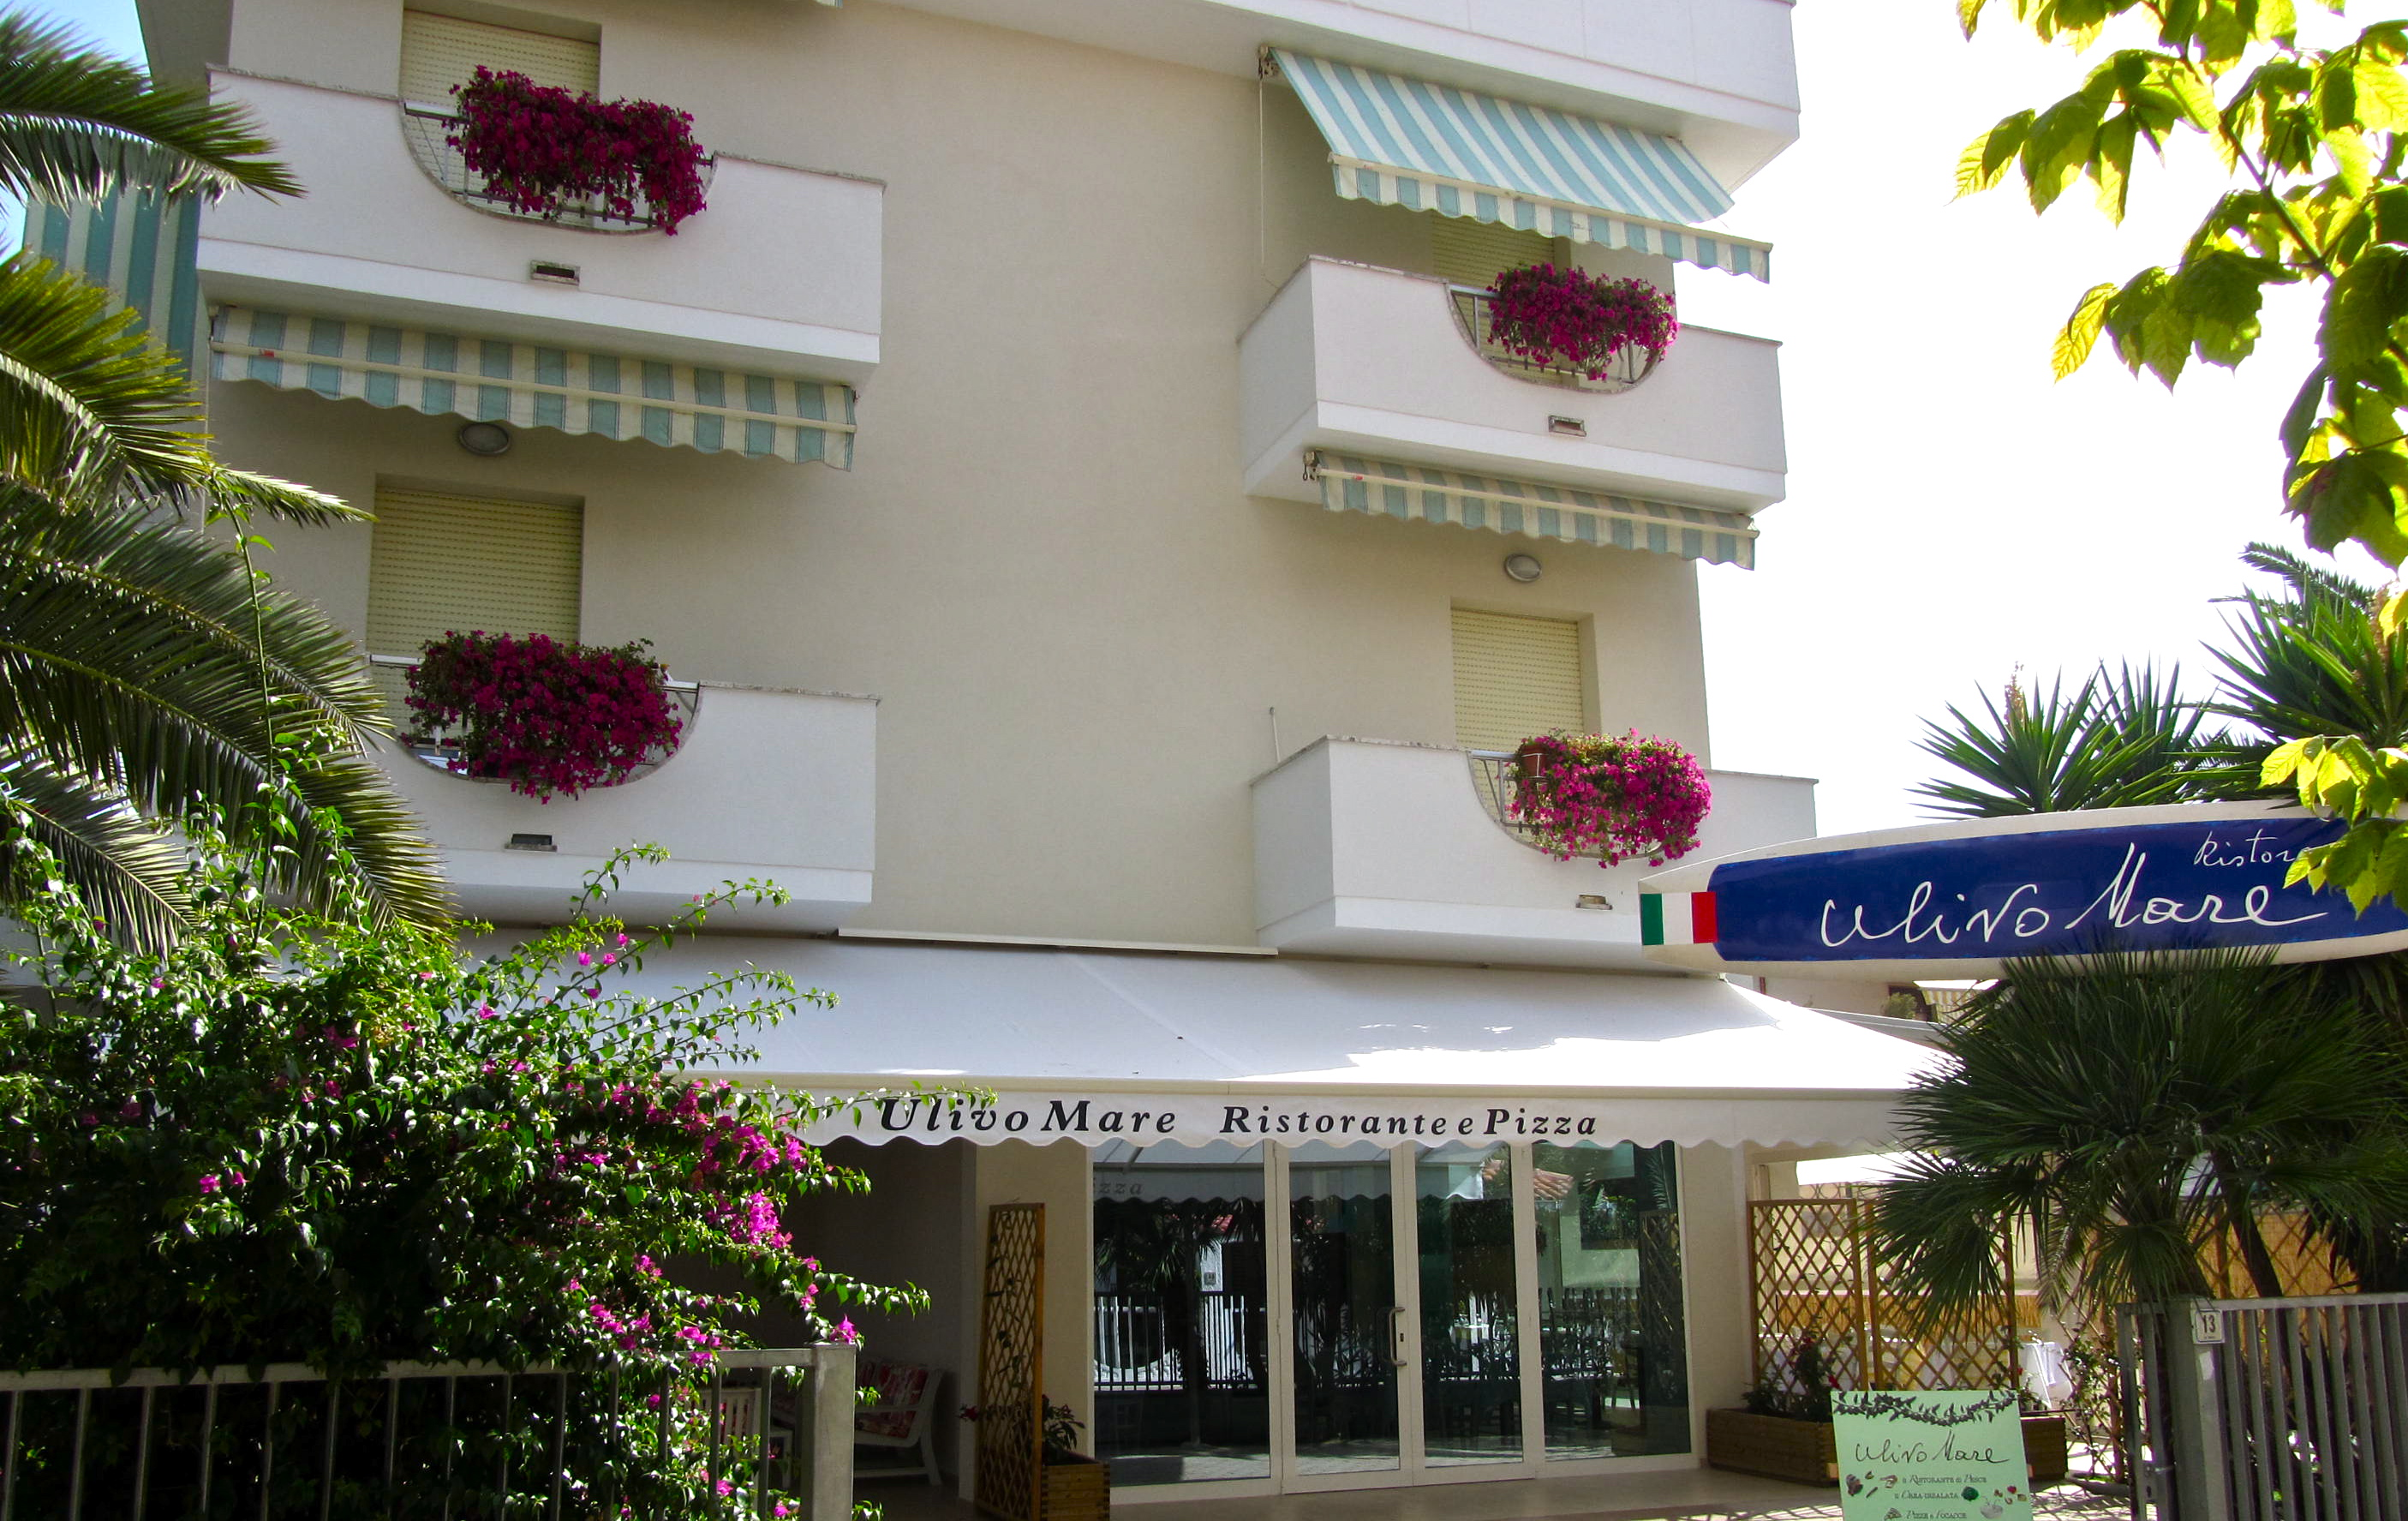 Hotel/Albergo, Ristorante, Bar, Pizzerie per celiaci a Teramo